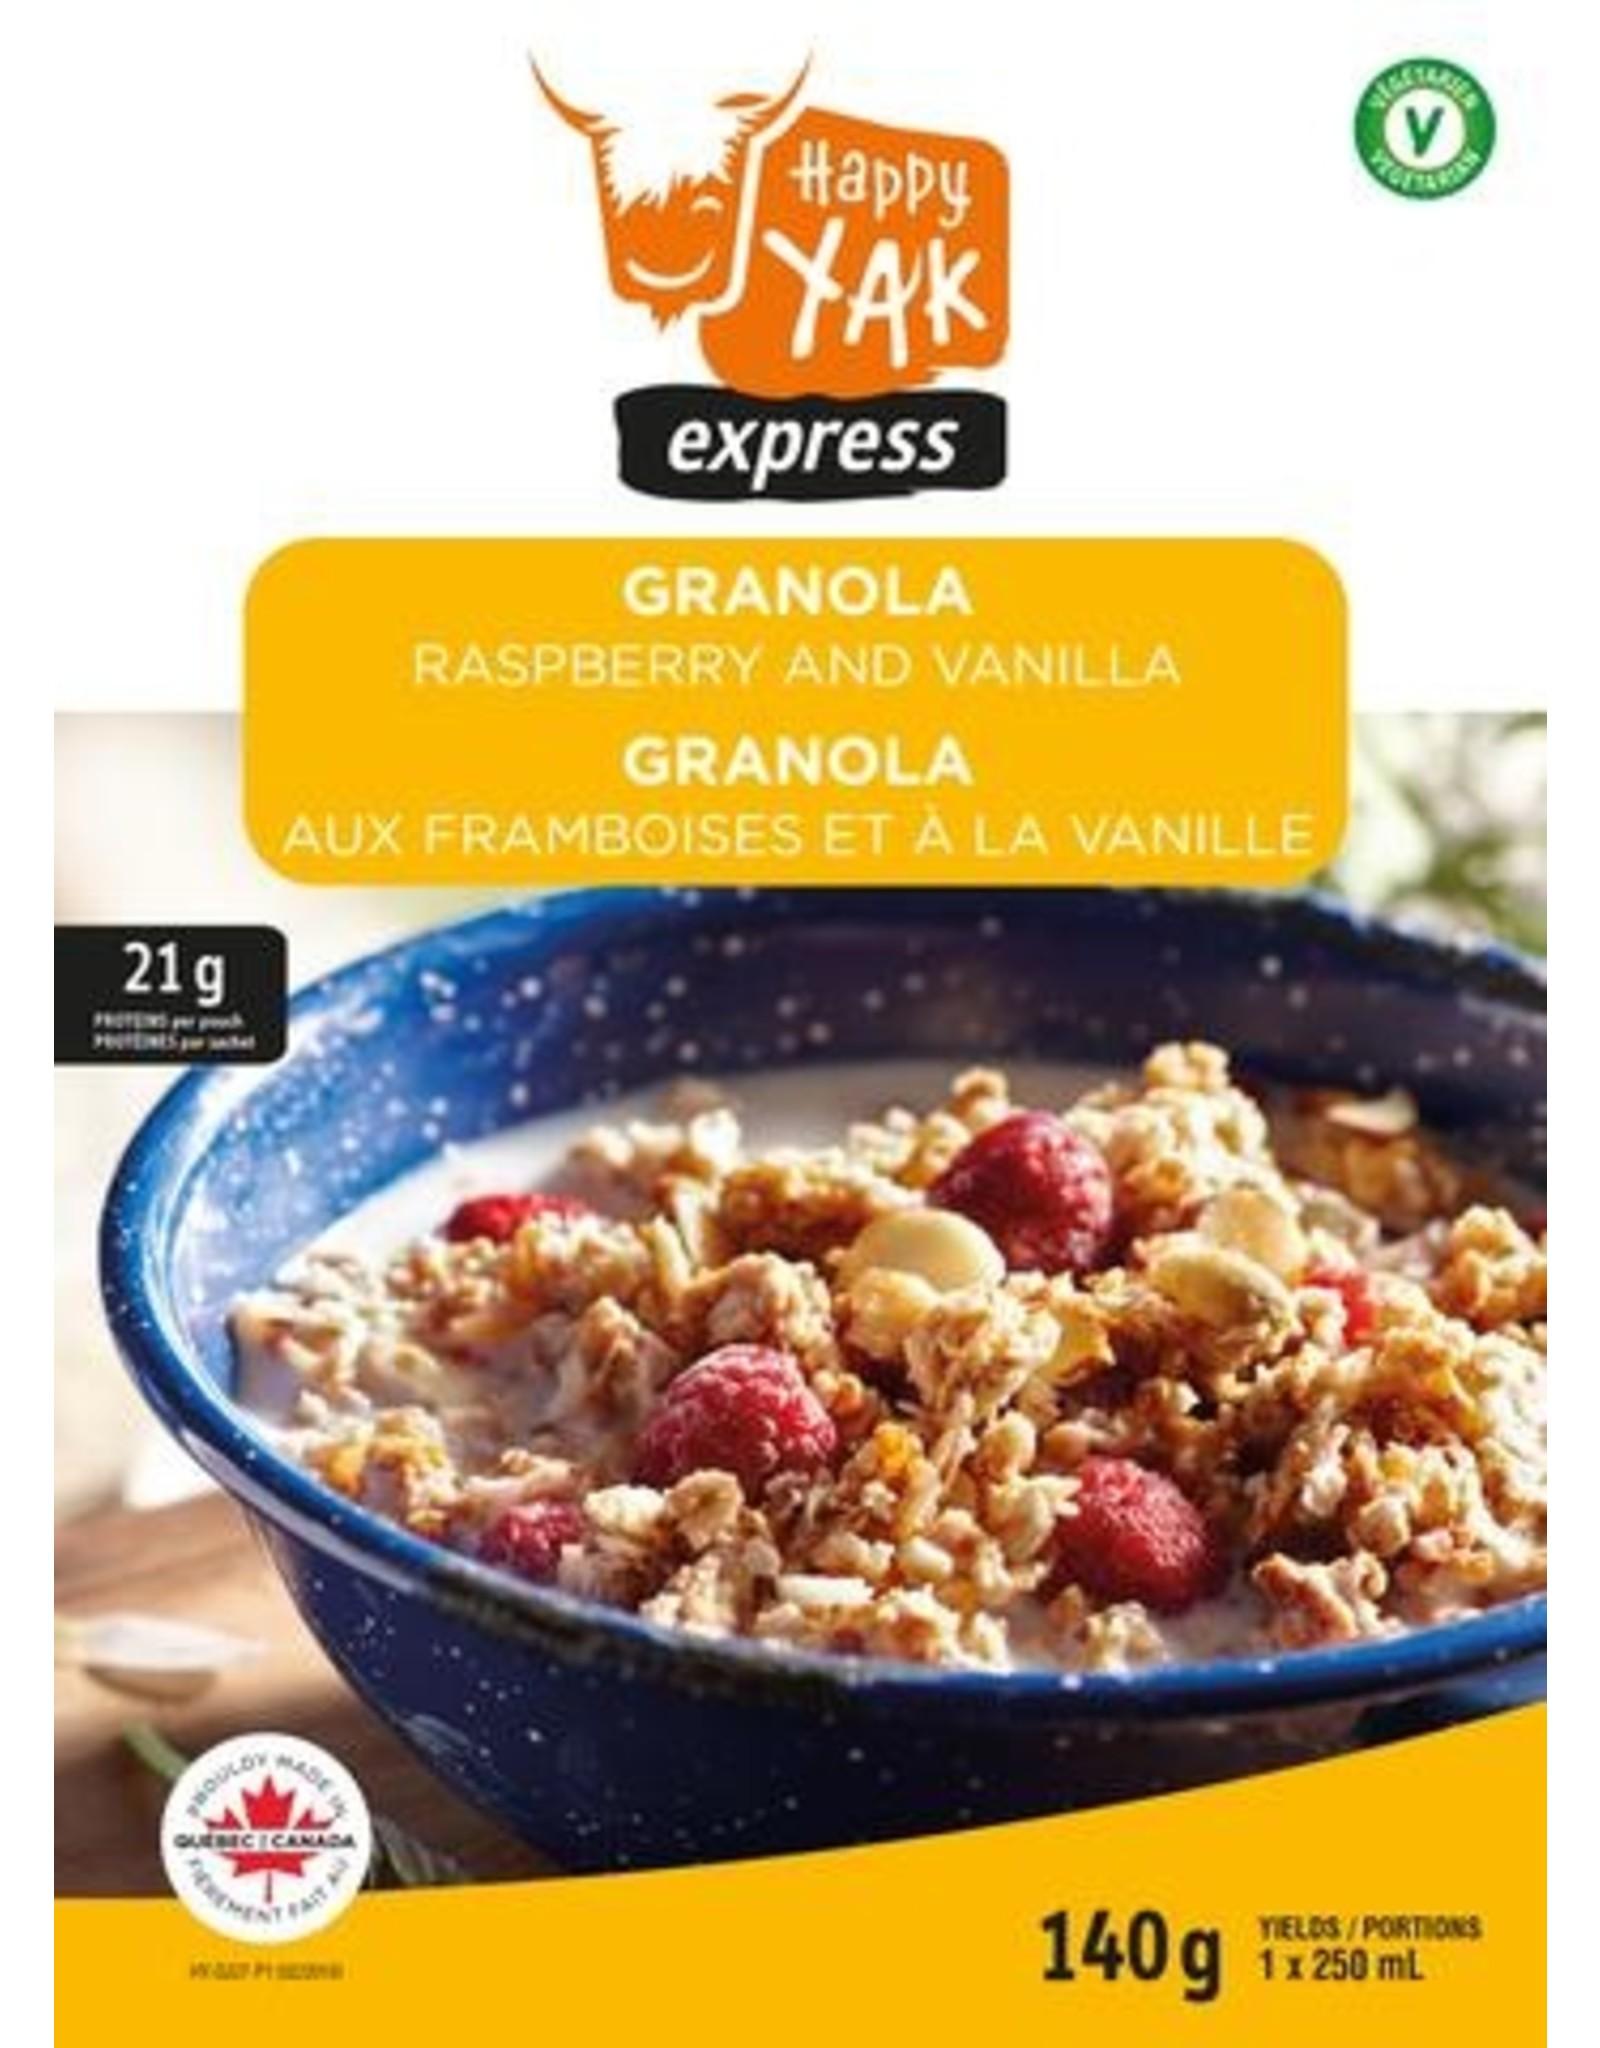 Happy Yak Happy Yak Raspberry & Vanilla Granola